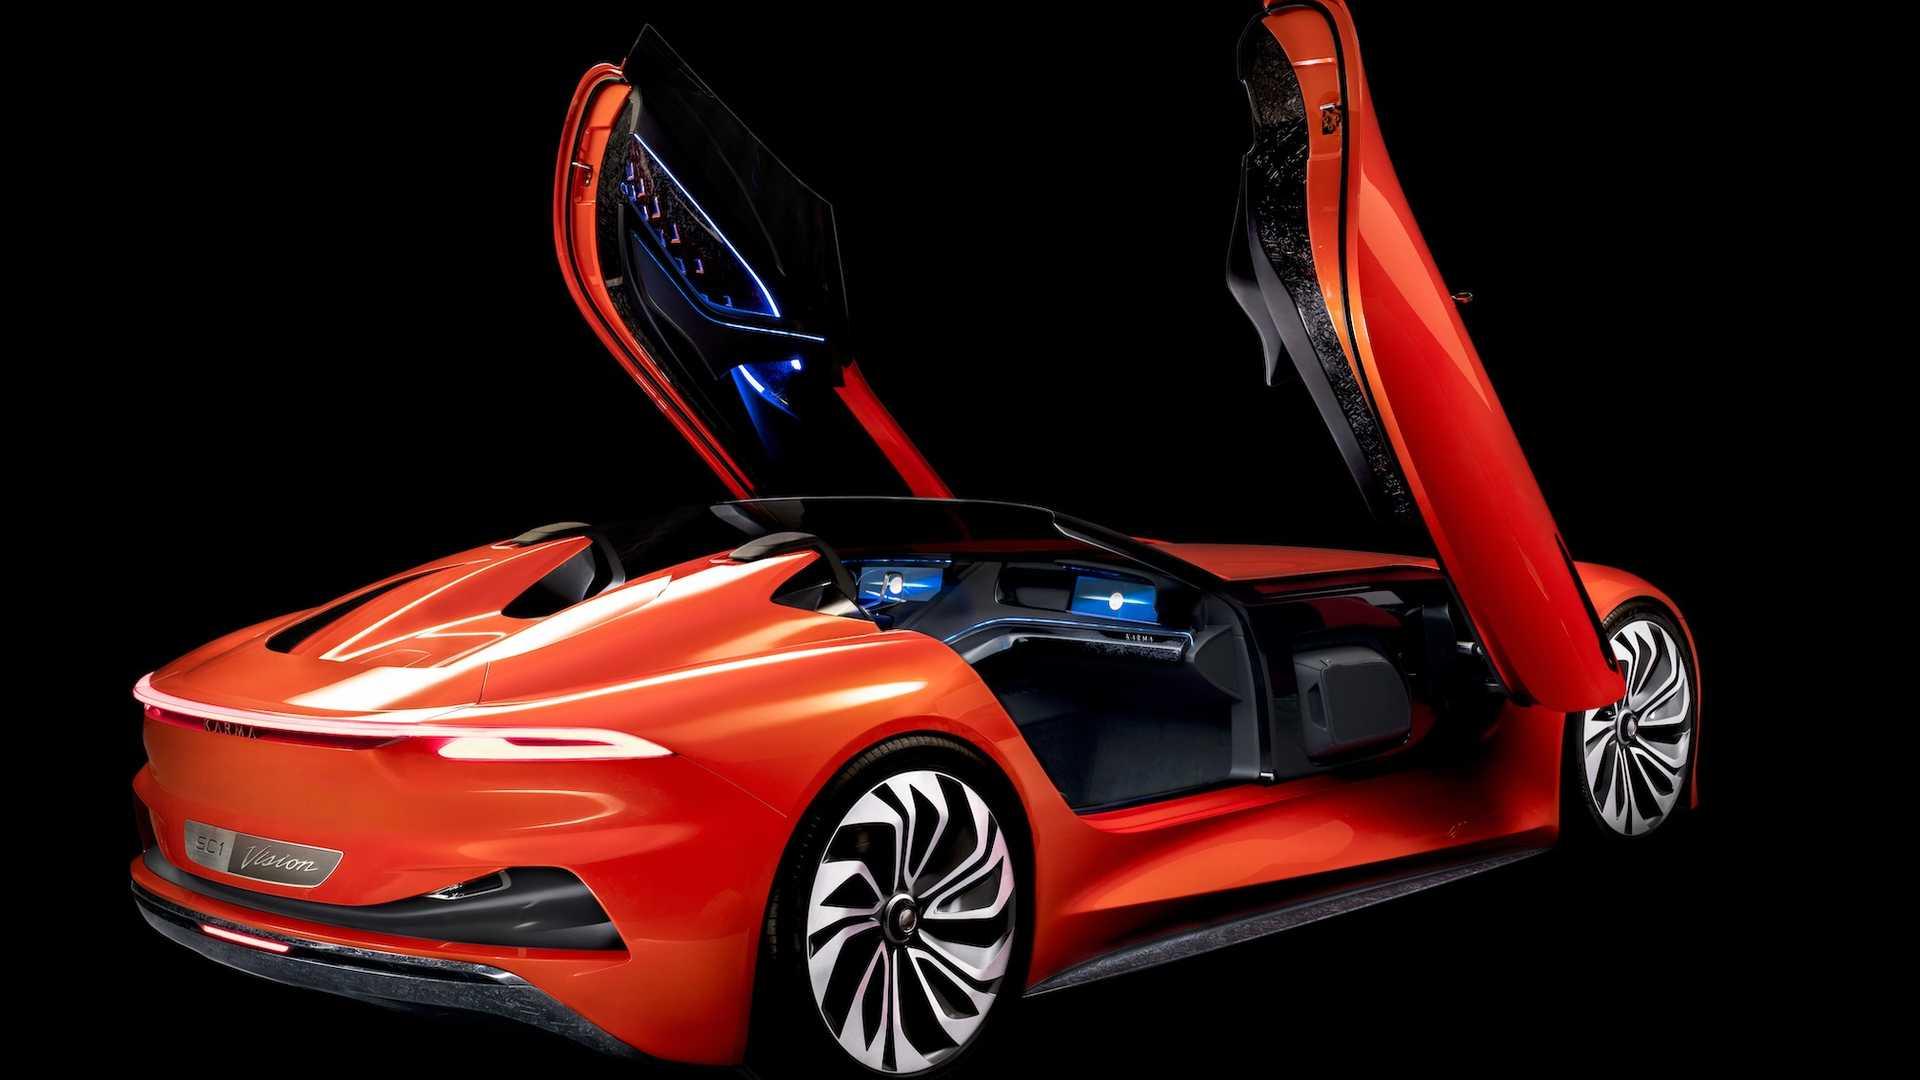 Karma SC1 Vision Concept Previews Design Language Of Tomorrow 1920x1080